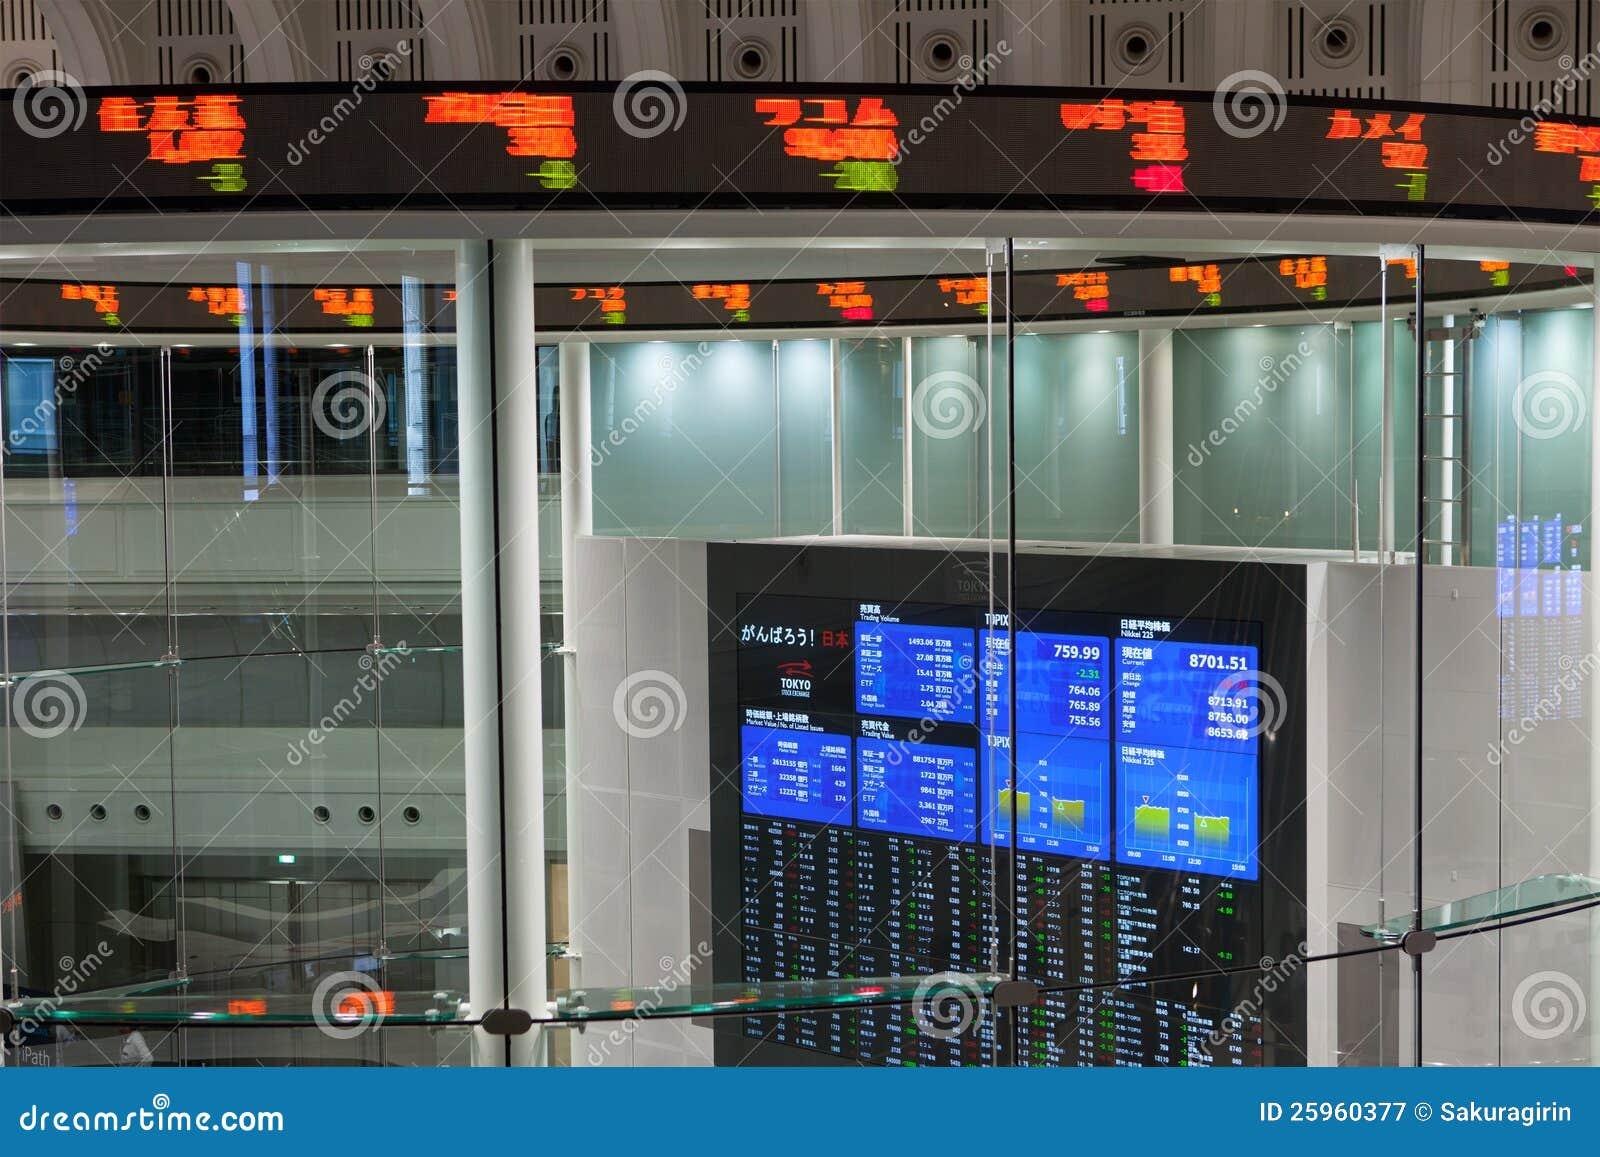 Casino electric savings llc